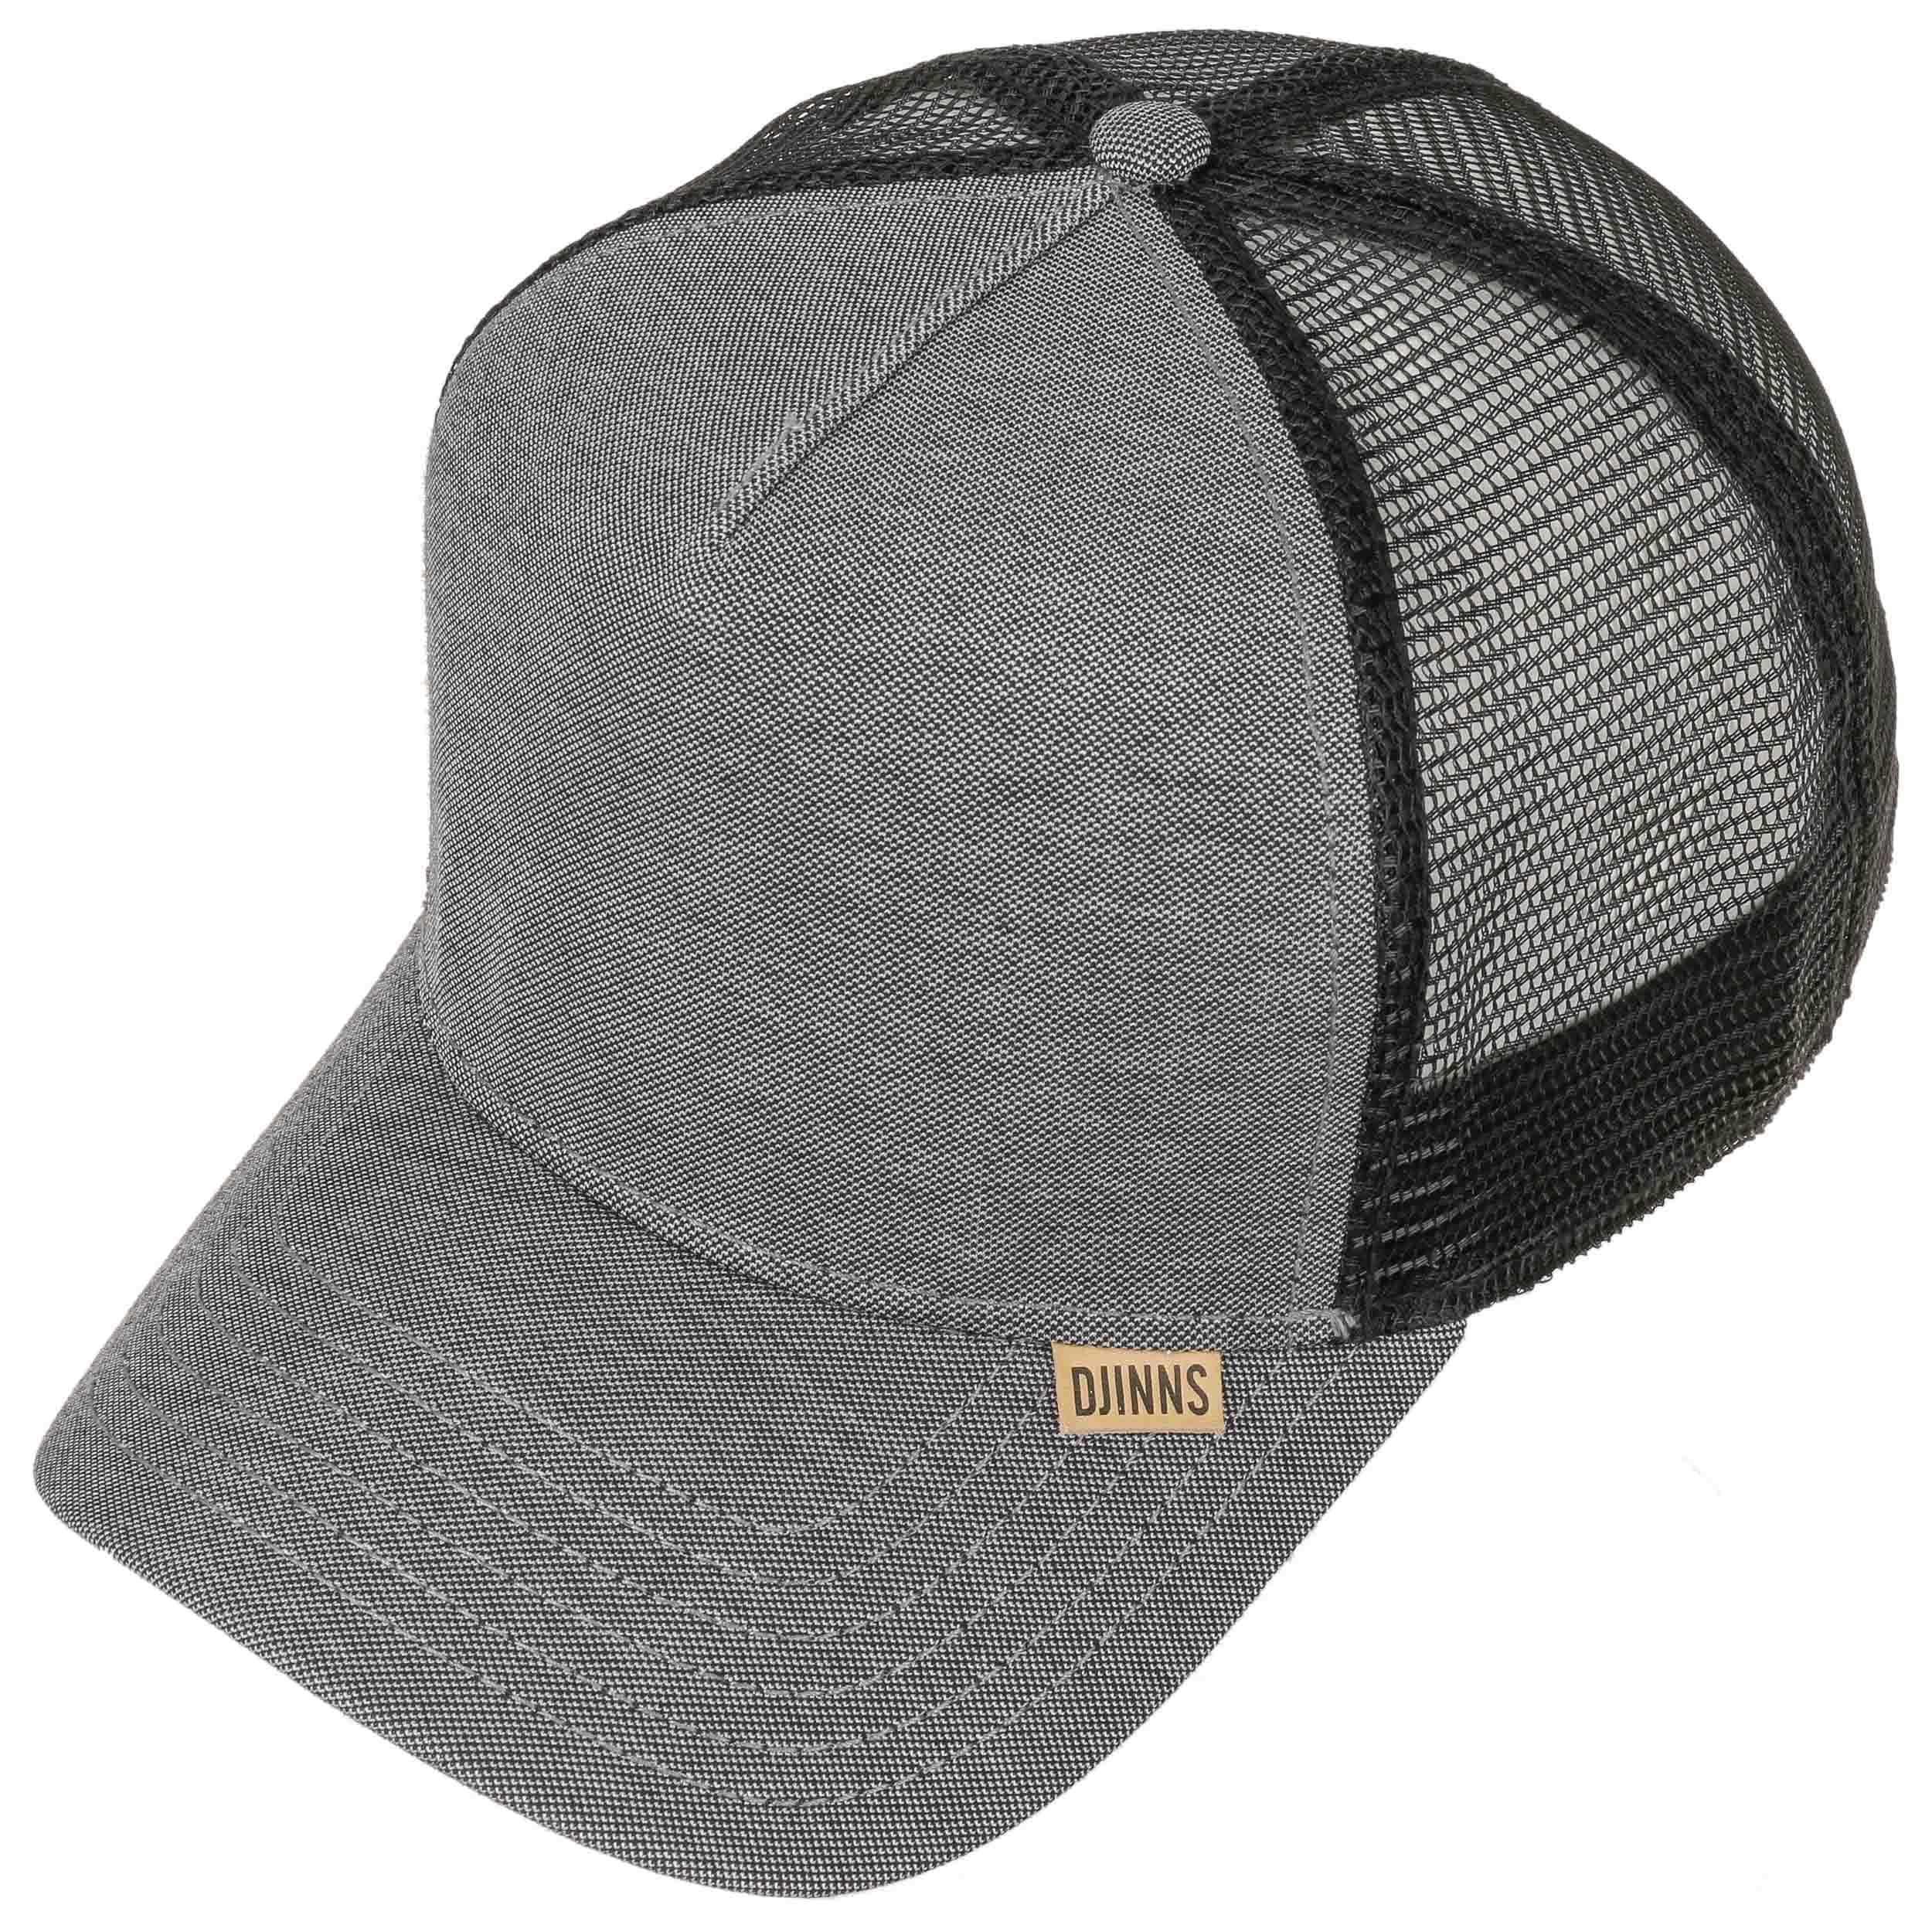 jersey piqu hft trucker cap by djinns eur 21 99 hats. Black Bedroom Furniture Sets. Home Design Ideas